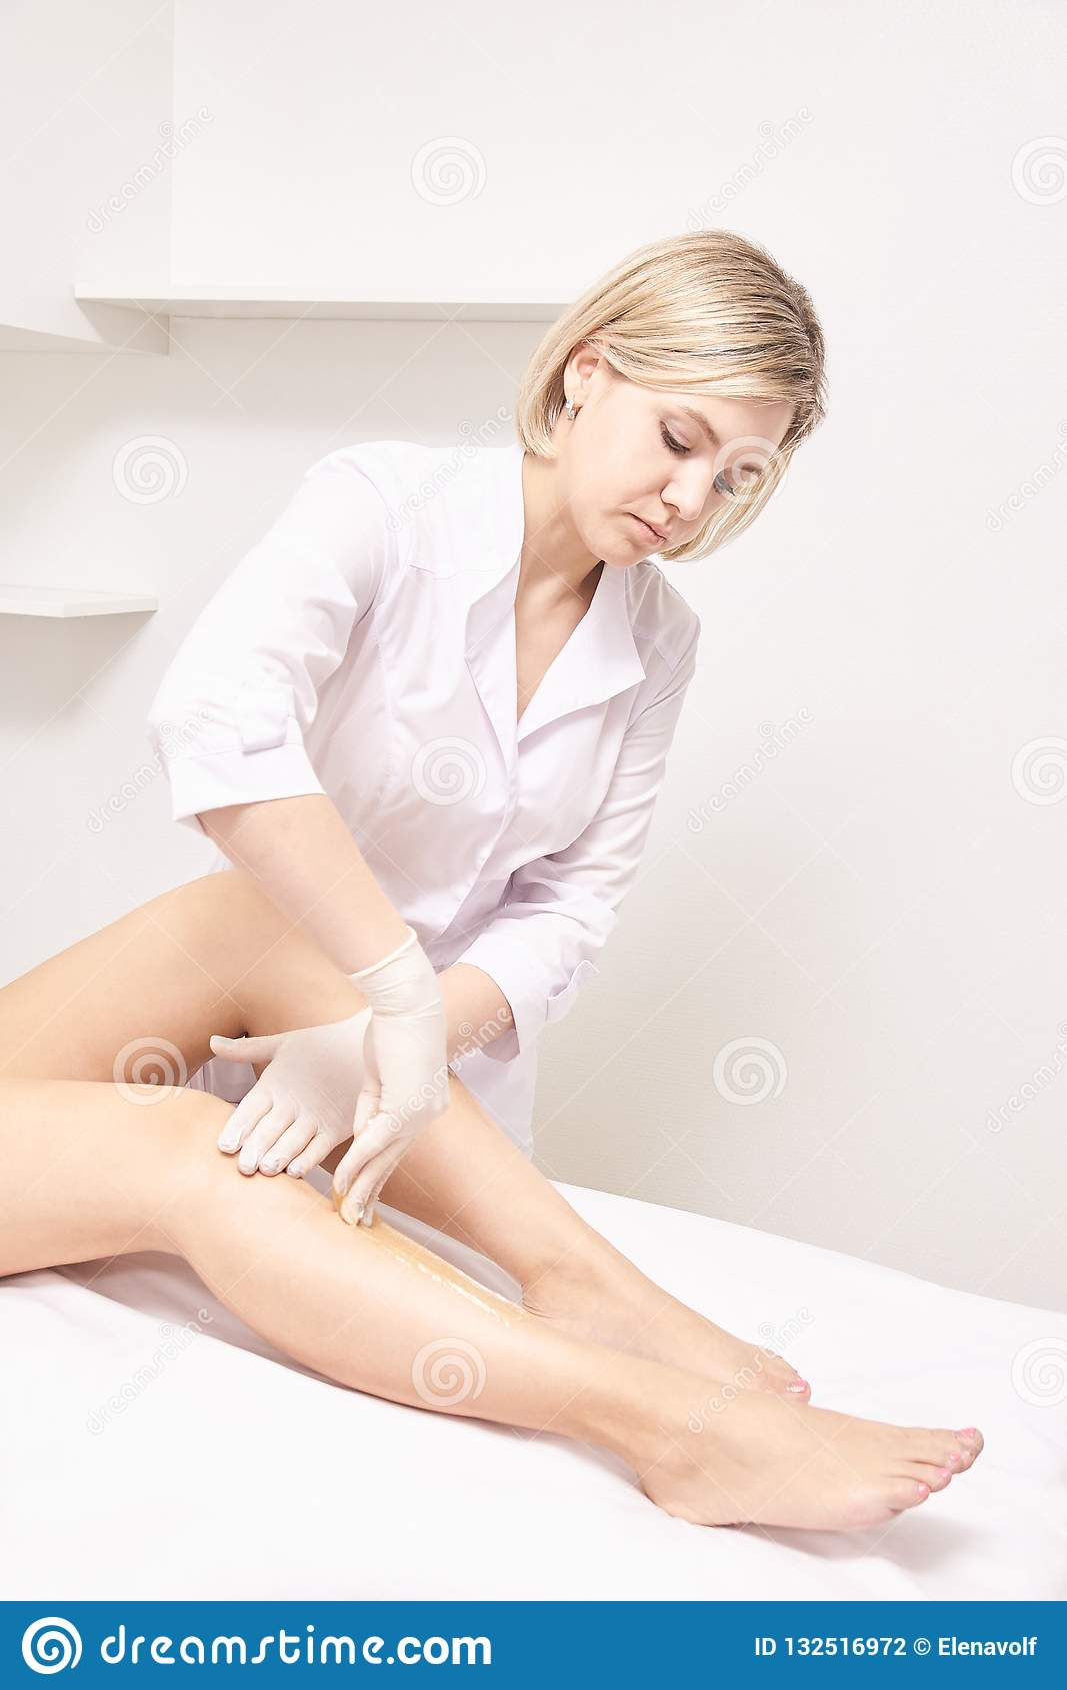 Depilation spa procedure. Woman hair remove waxing. Epilation sugaring. Legs foot